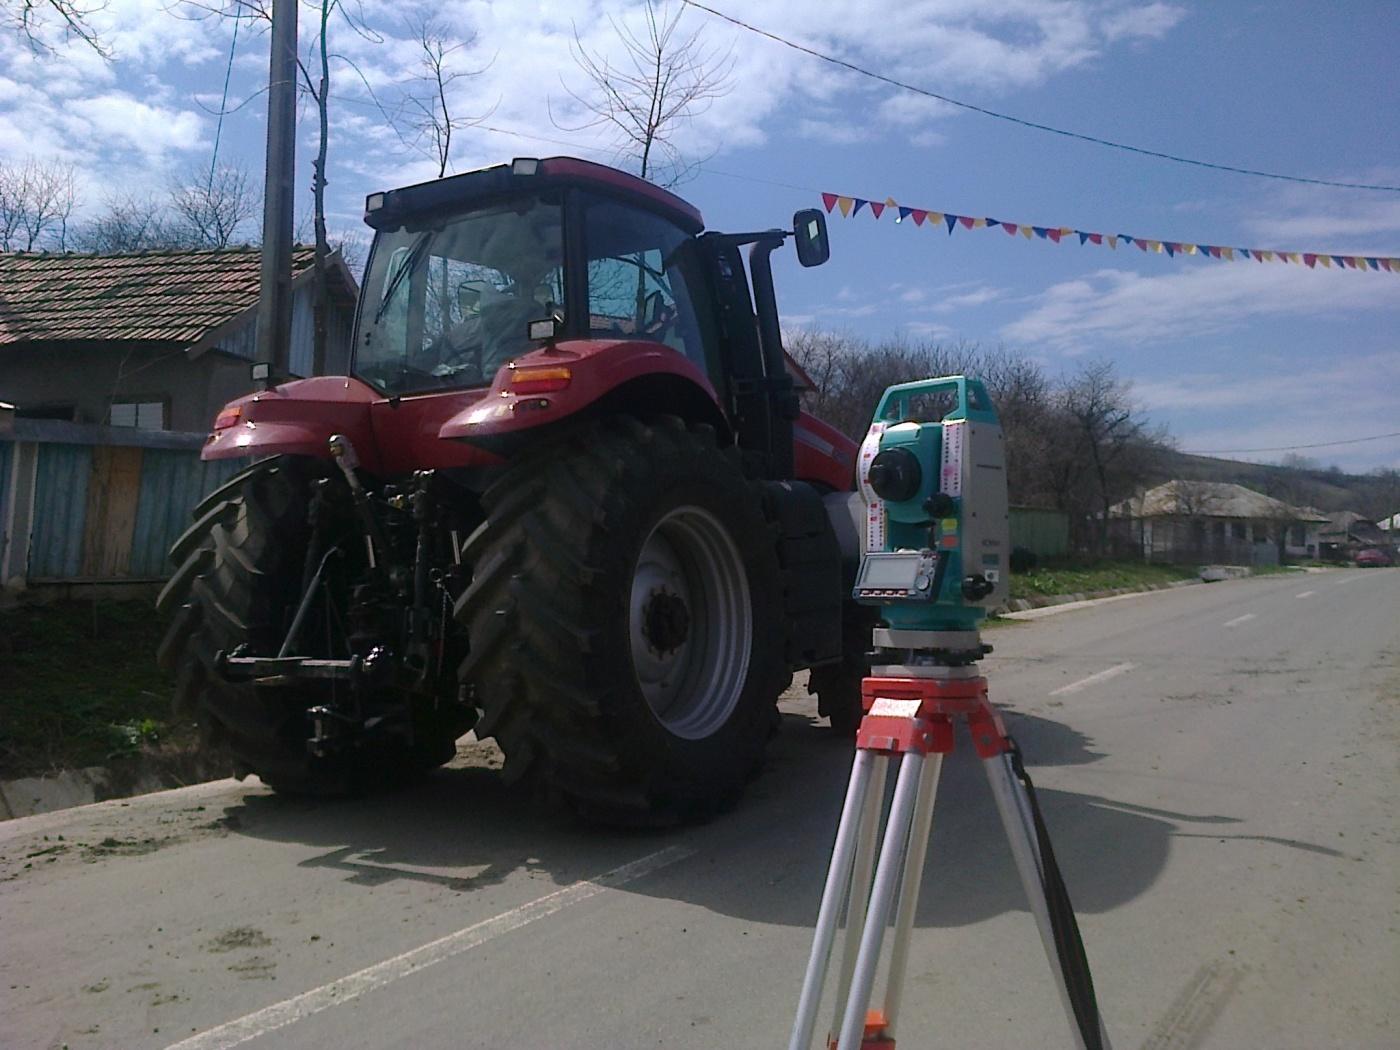 sokkia - Romania,Bacau, Dealu Morii